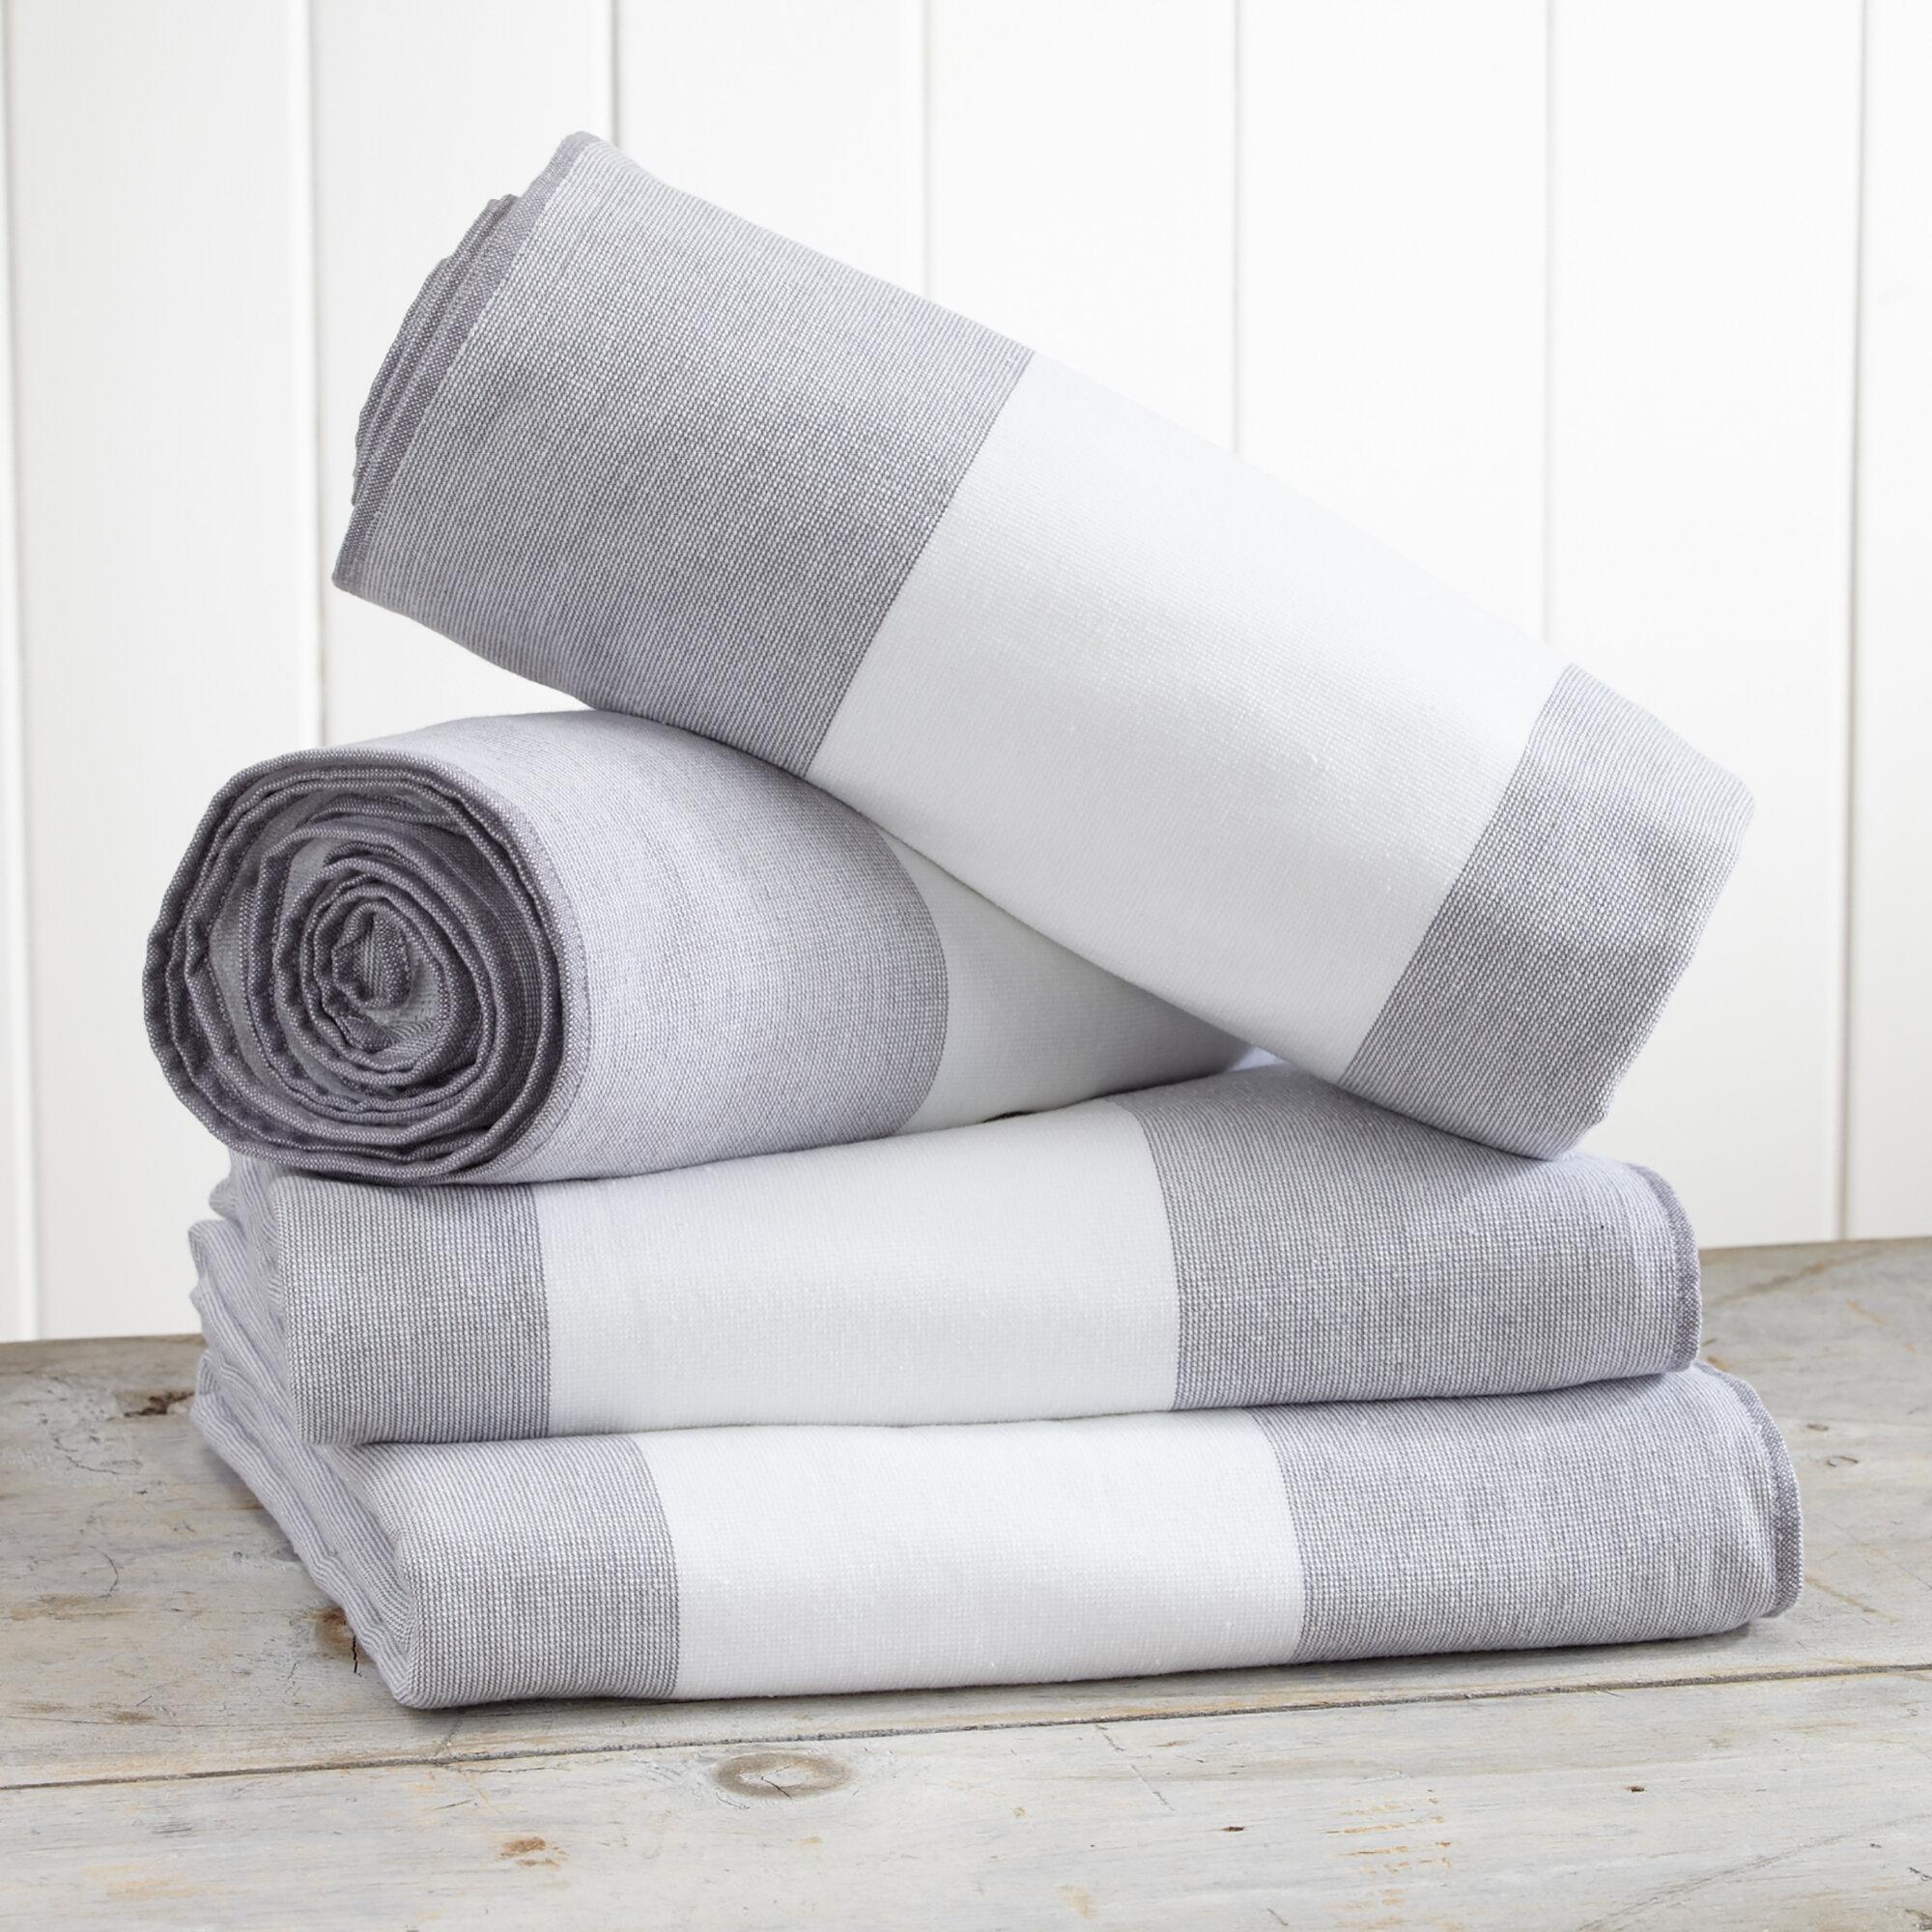 100 Cotton Beach Towel Set